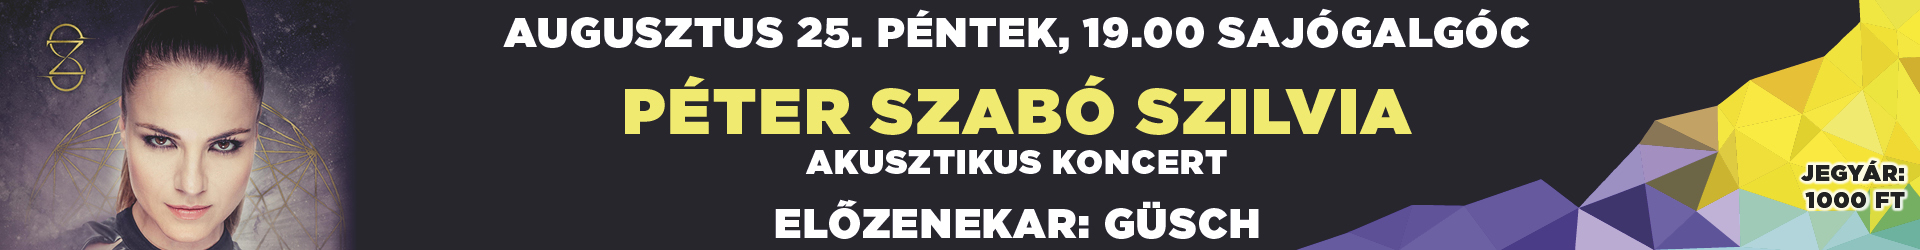 Sajógalgóc Péter Szabó